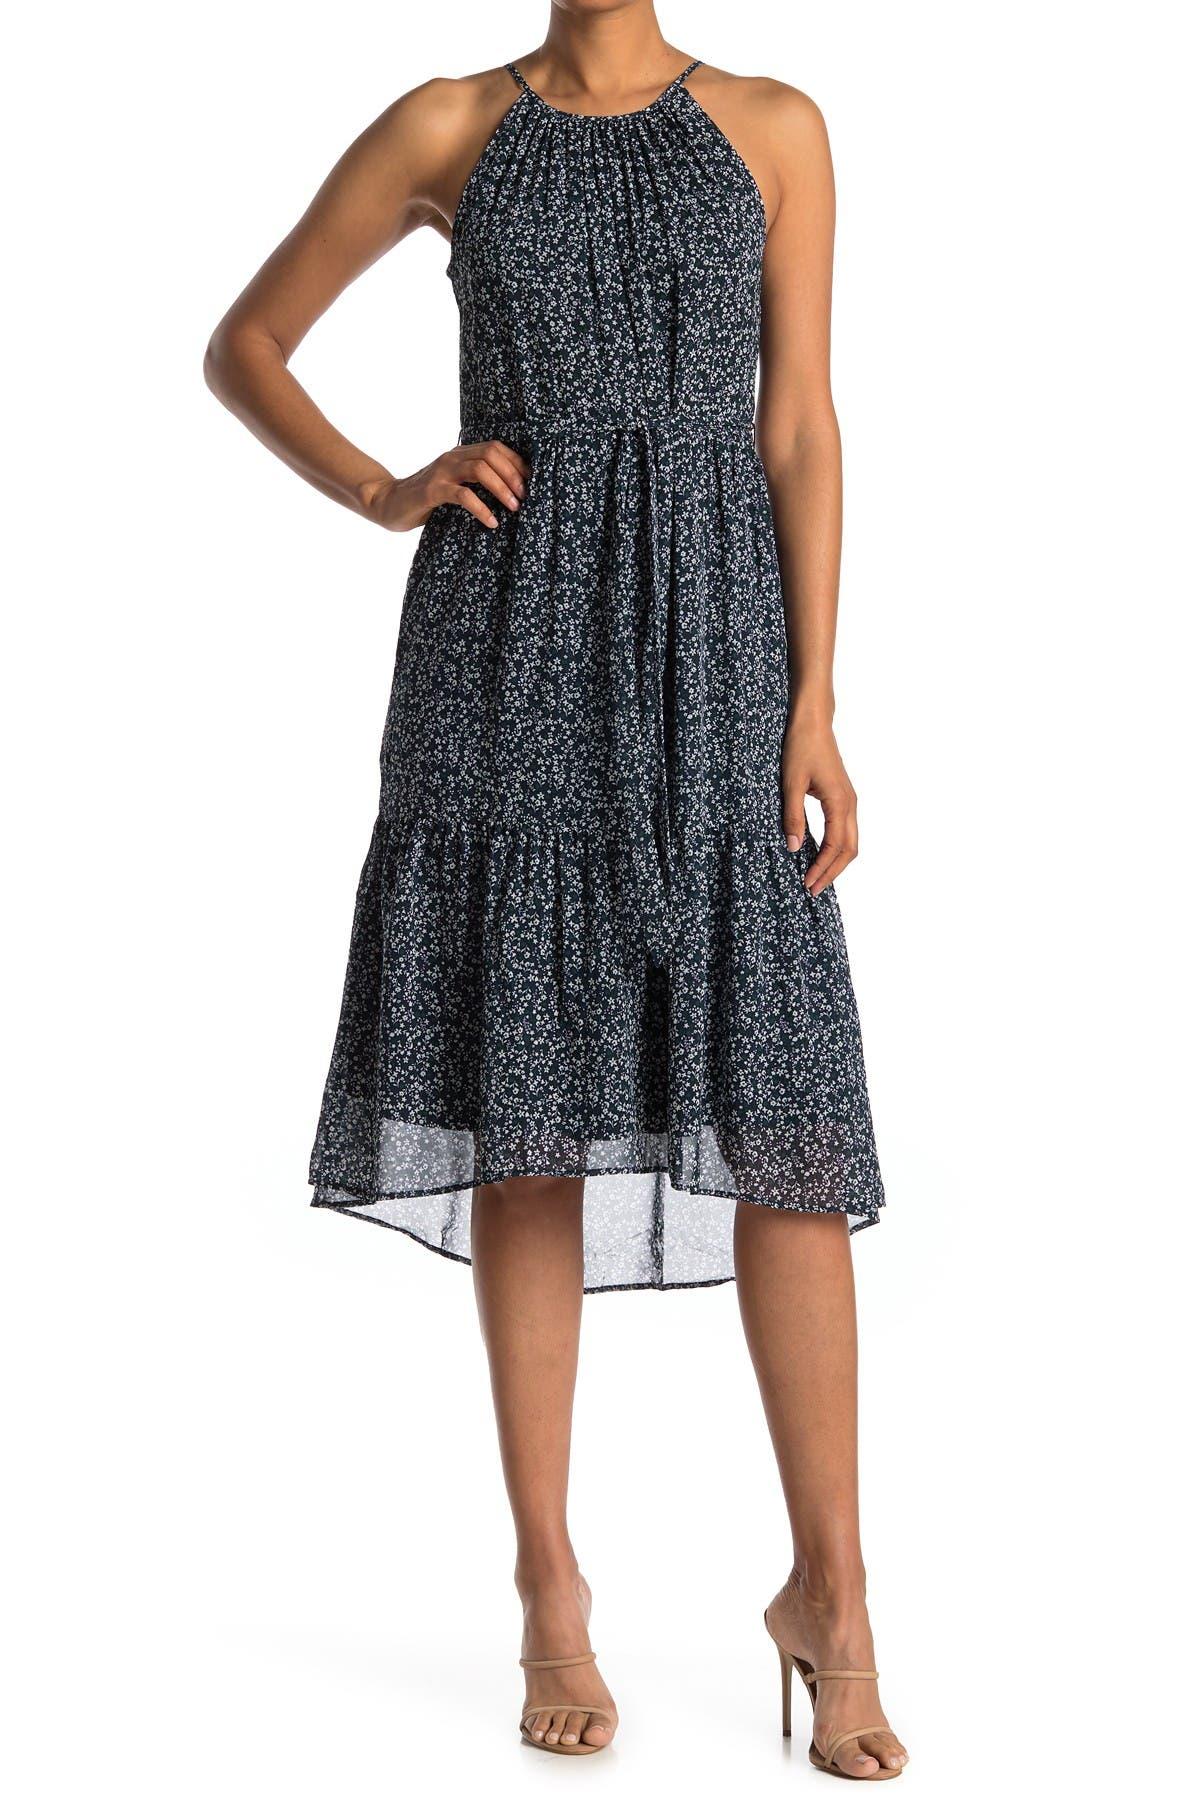 Image of DR2 by Daniel Rainn Floral Tiered Midi Dress